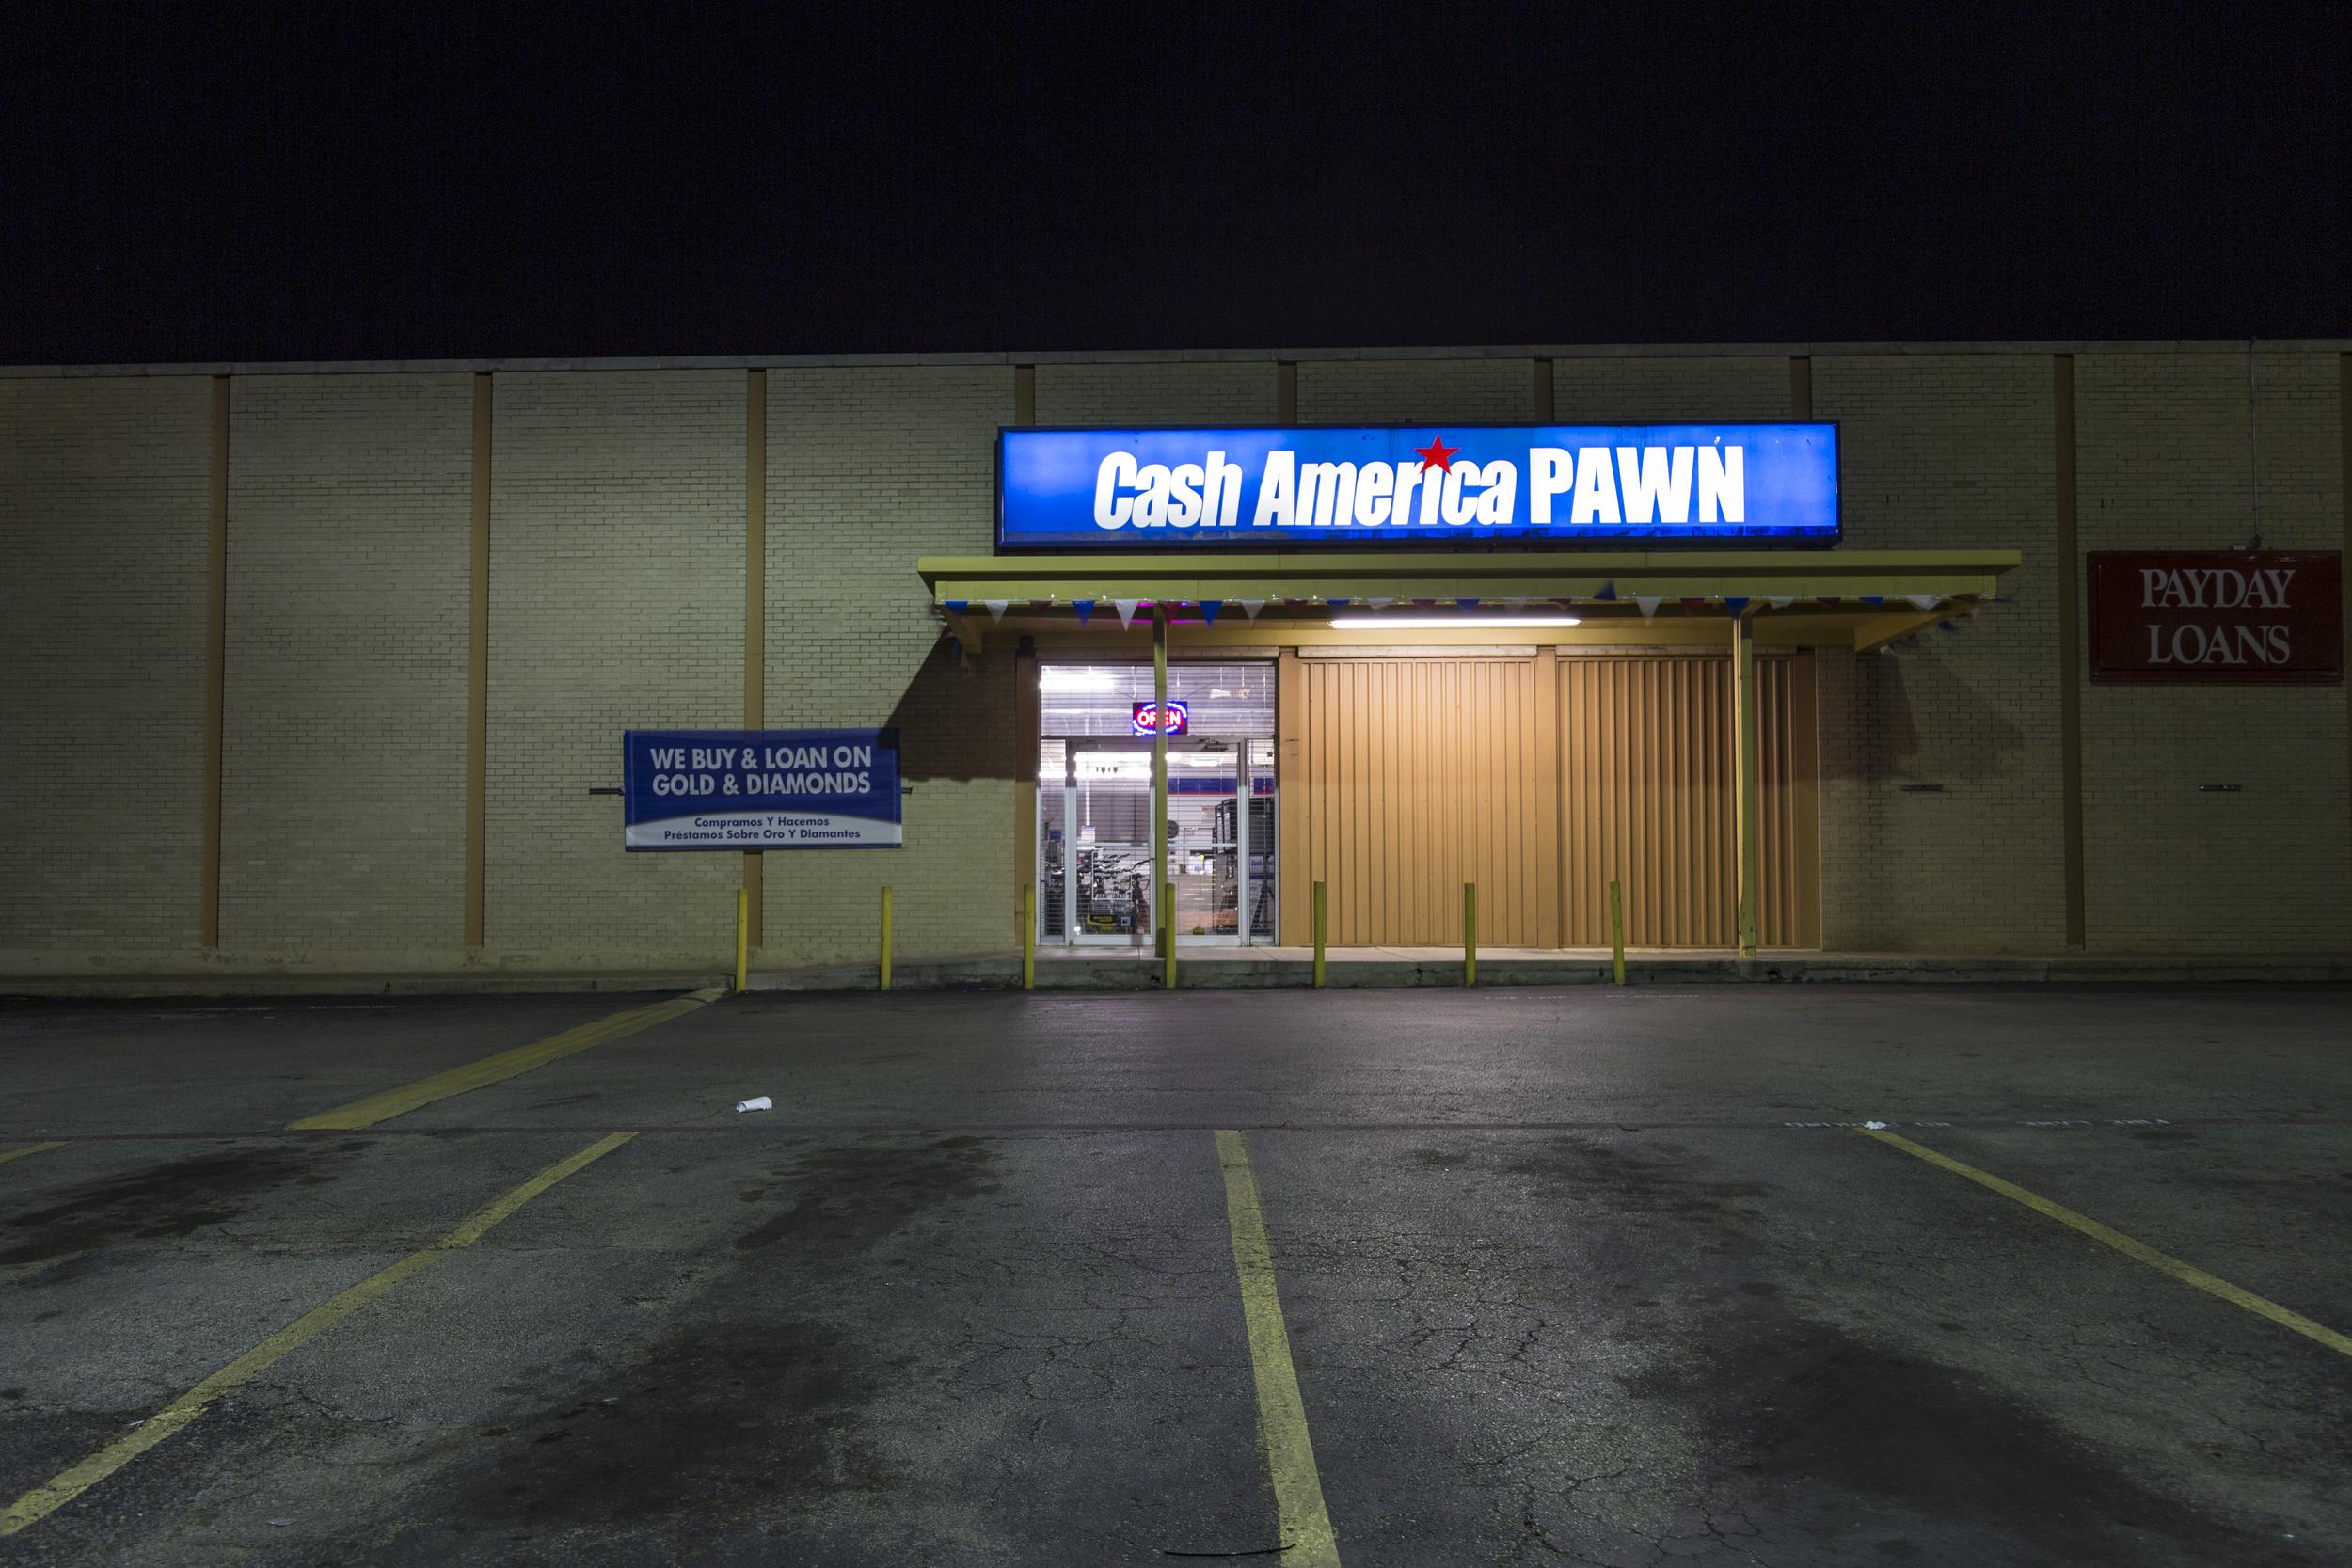 Pawn Shop Series - Cash America Pawn